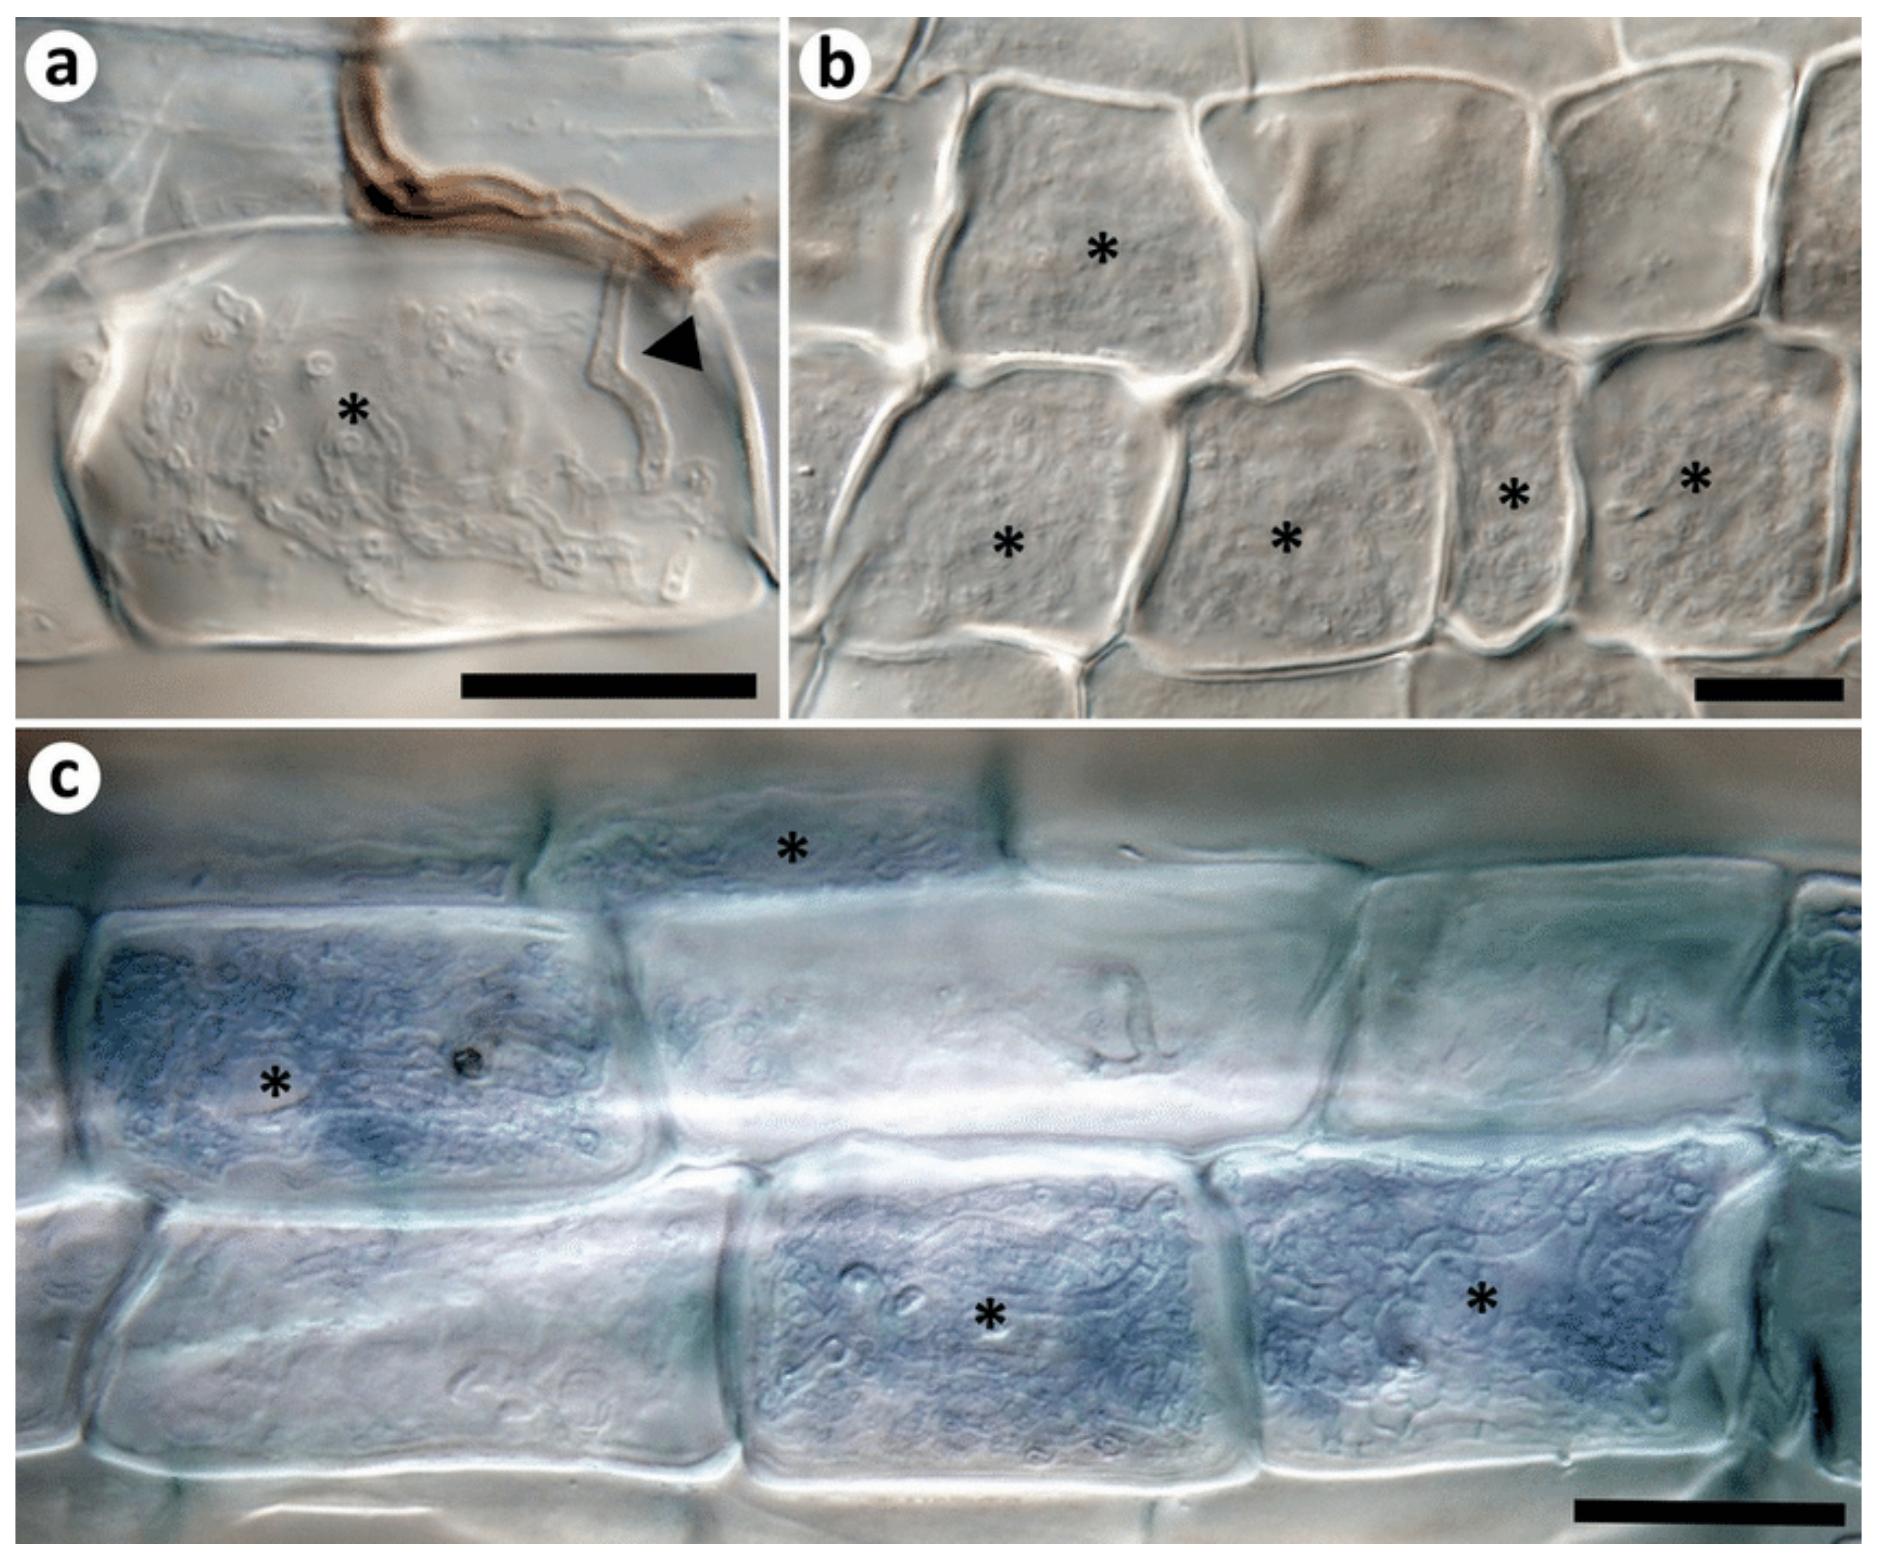 Ericoid mycorrhizae of   Rhizoscyphus ericae .